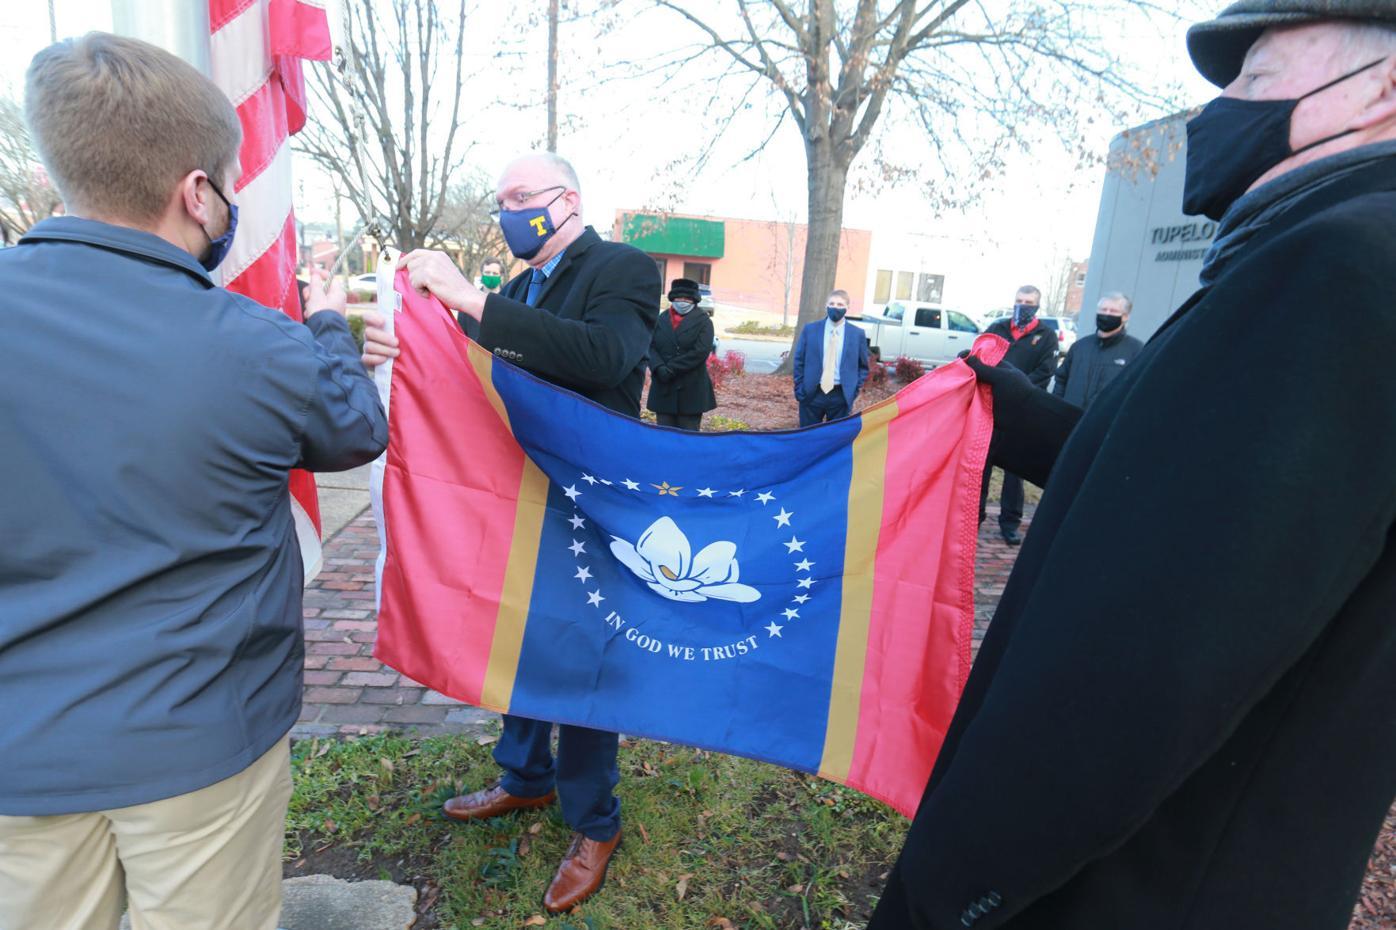 djr-2021-01-14-news-flag-twp1